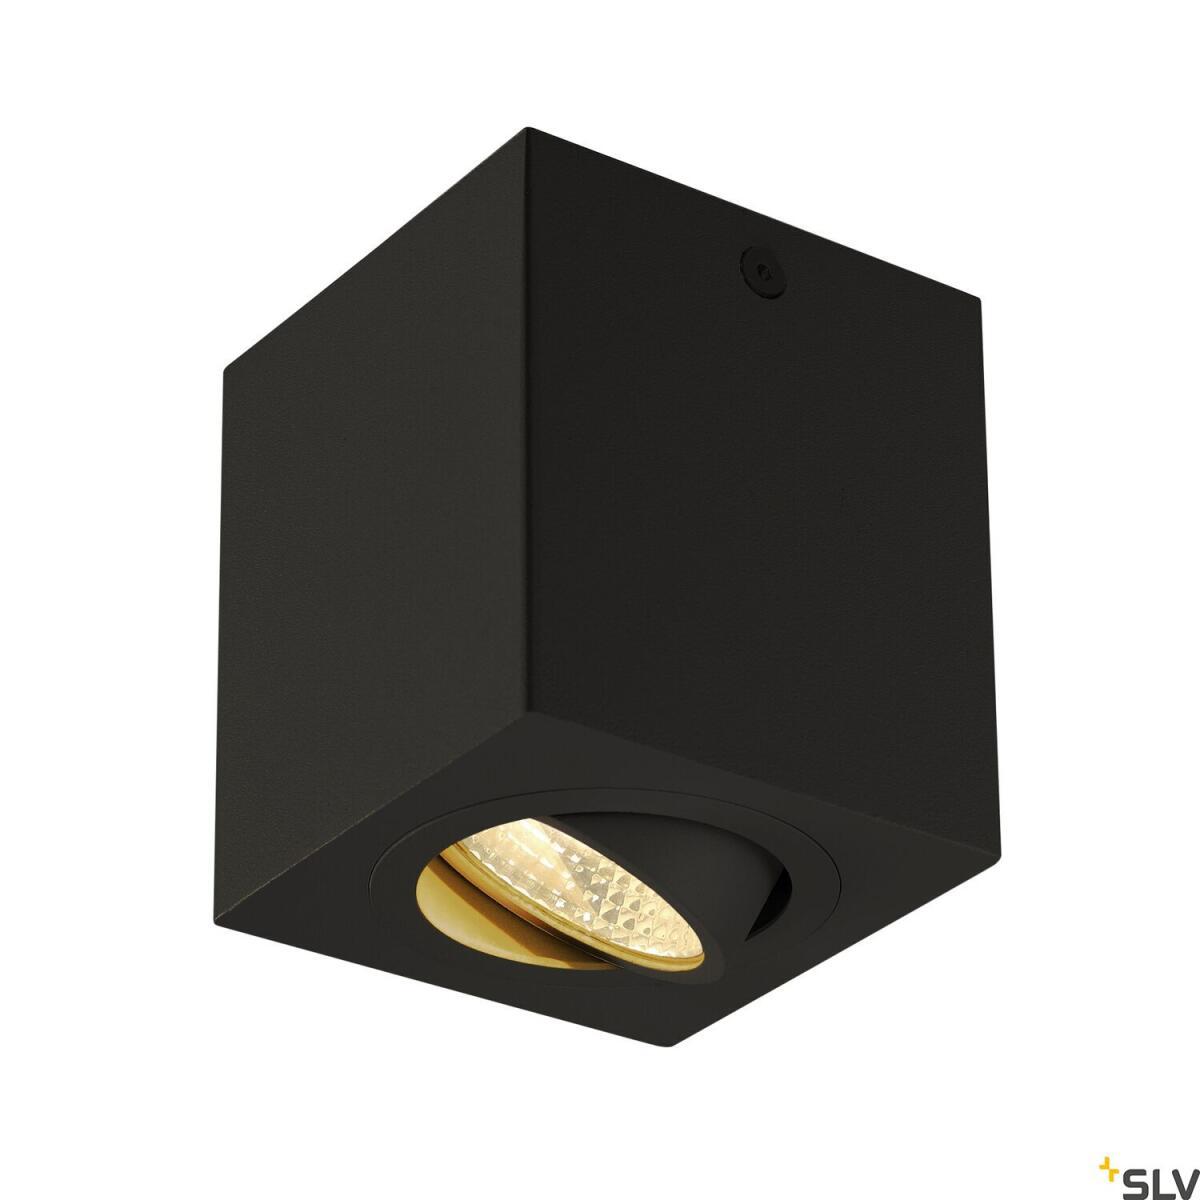 triledo square cl aufbau downlight mattschwarz led 6w 38. Black Bedroom Furniture Sets. Home Design Ideas